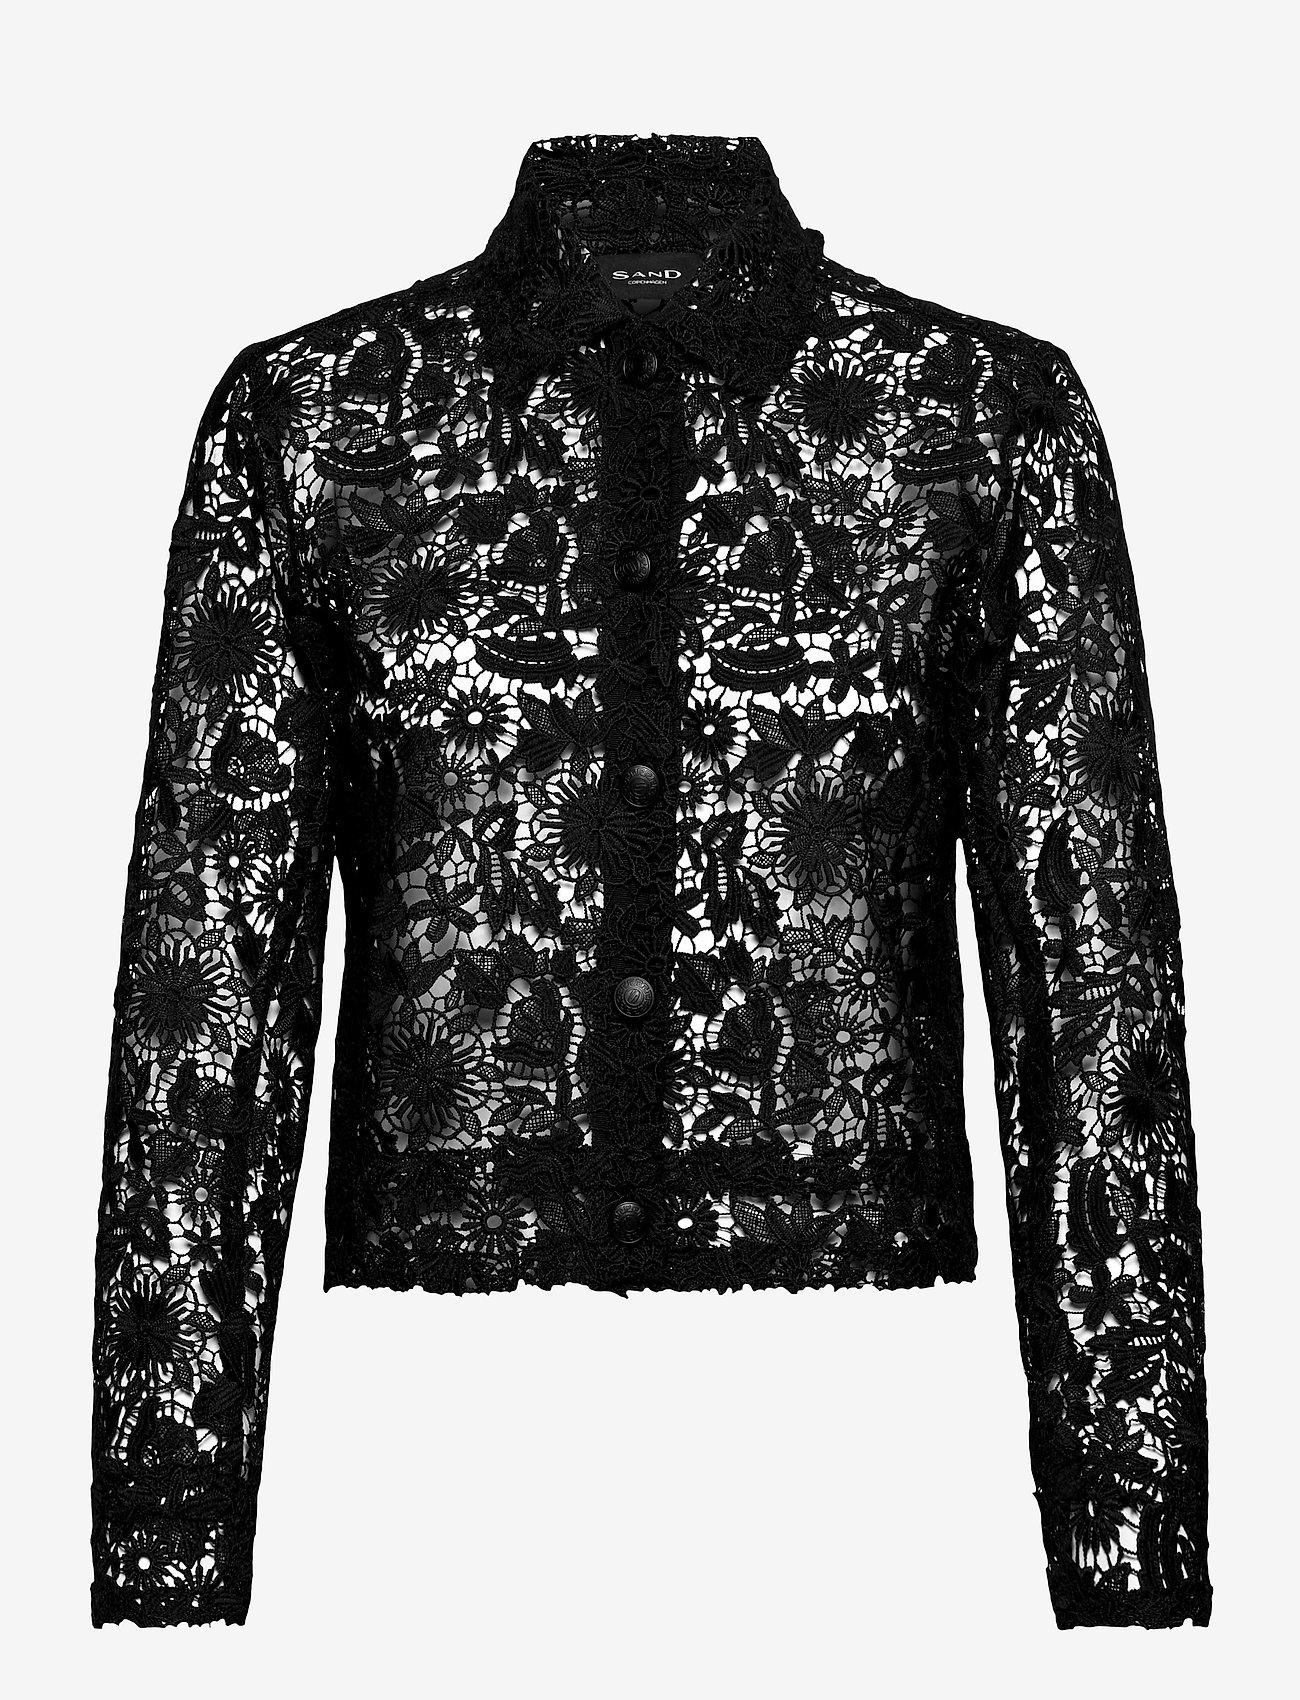 SAND - 3180 - Kaela - overhemden met lange mouwen - black - 0